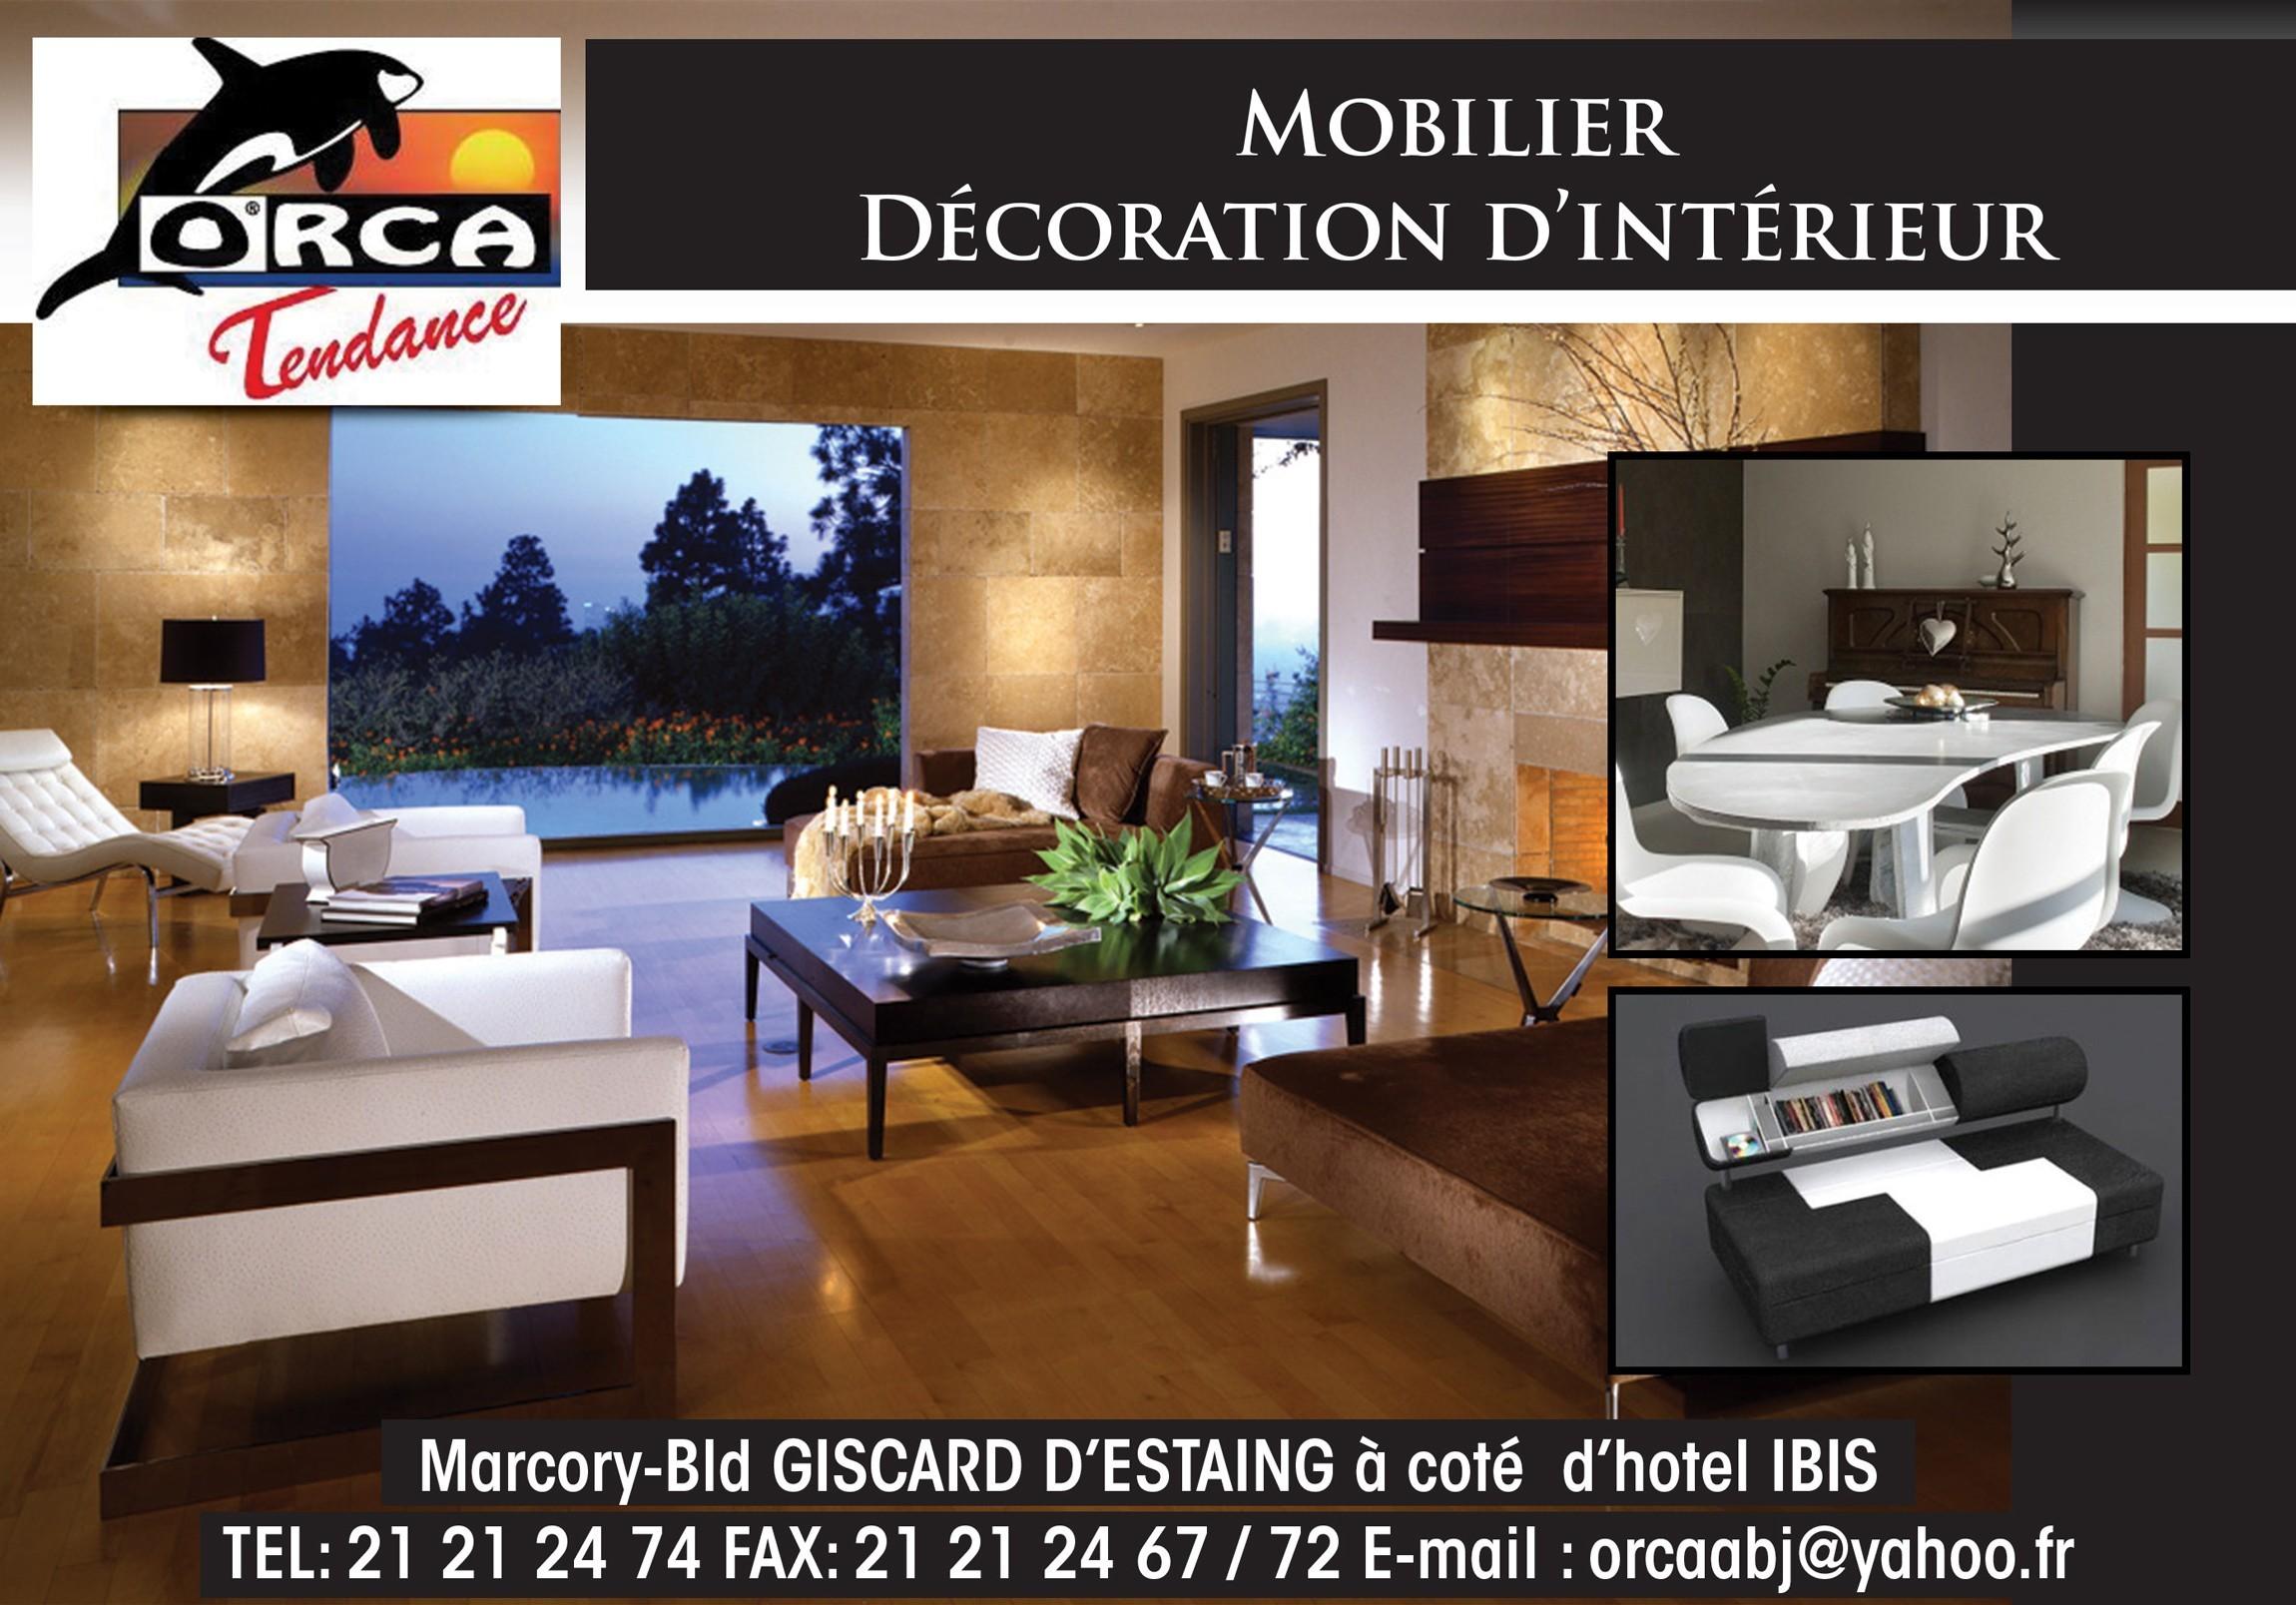 orca tendance mobilier de bureau. Black Bedroom Furniture Sets. Home Design Ideas